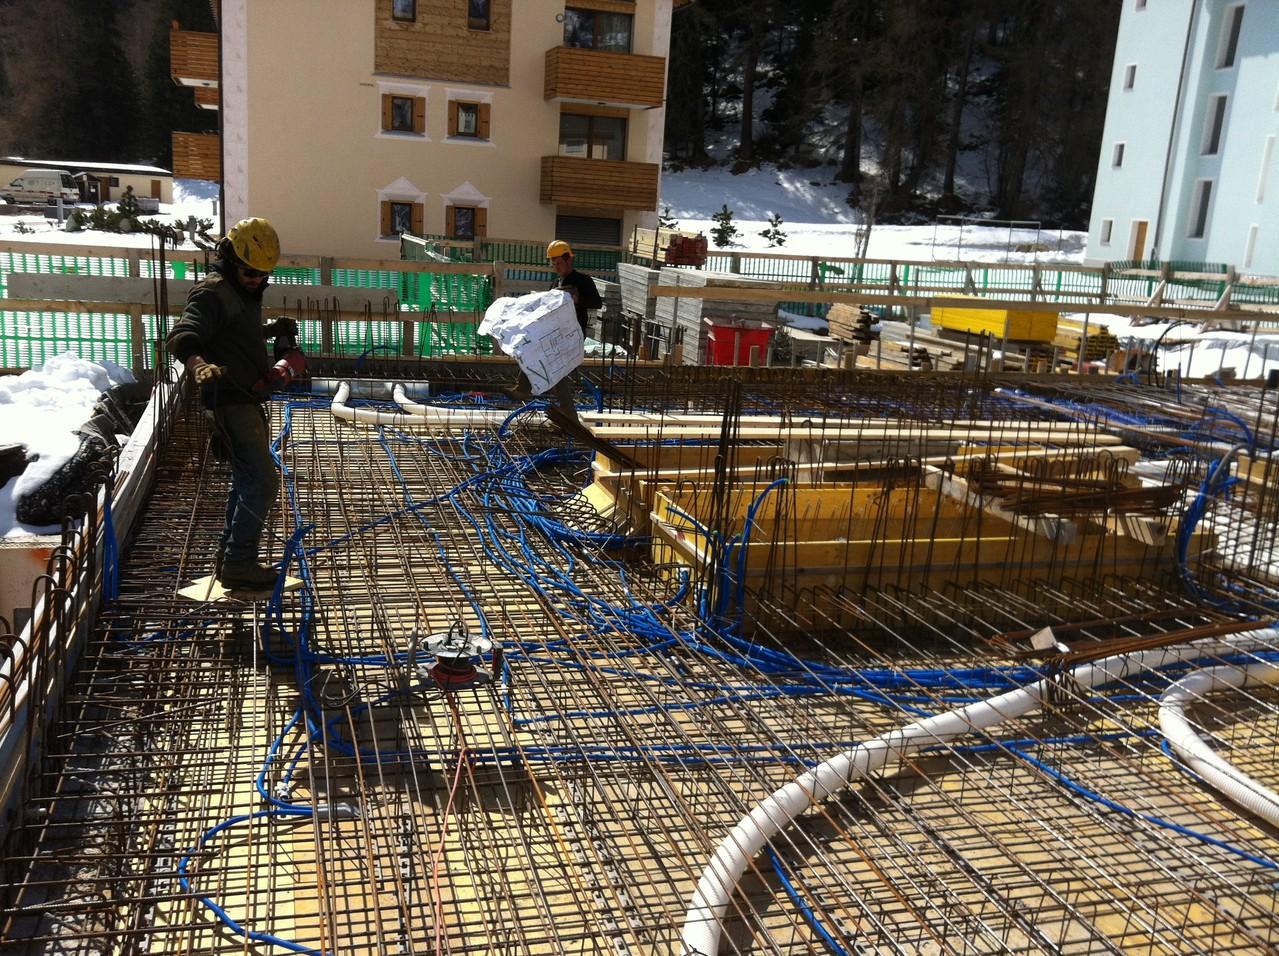 Baustelle April 2013